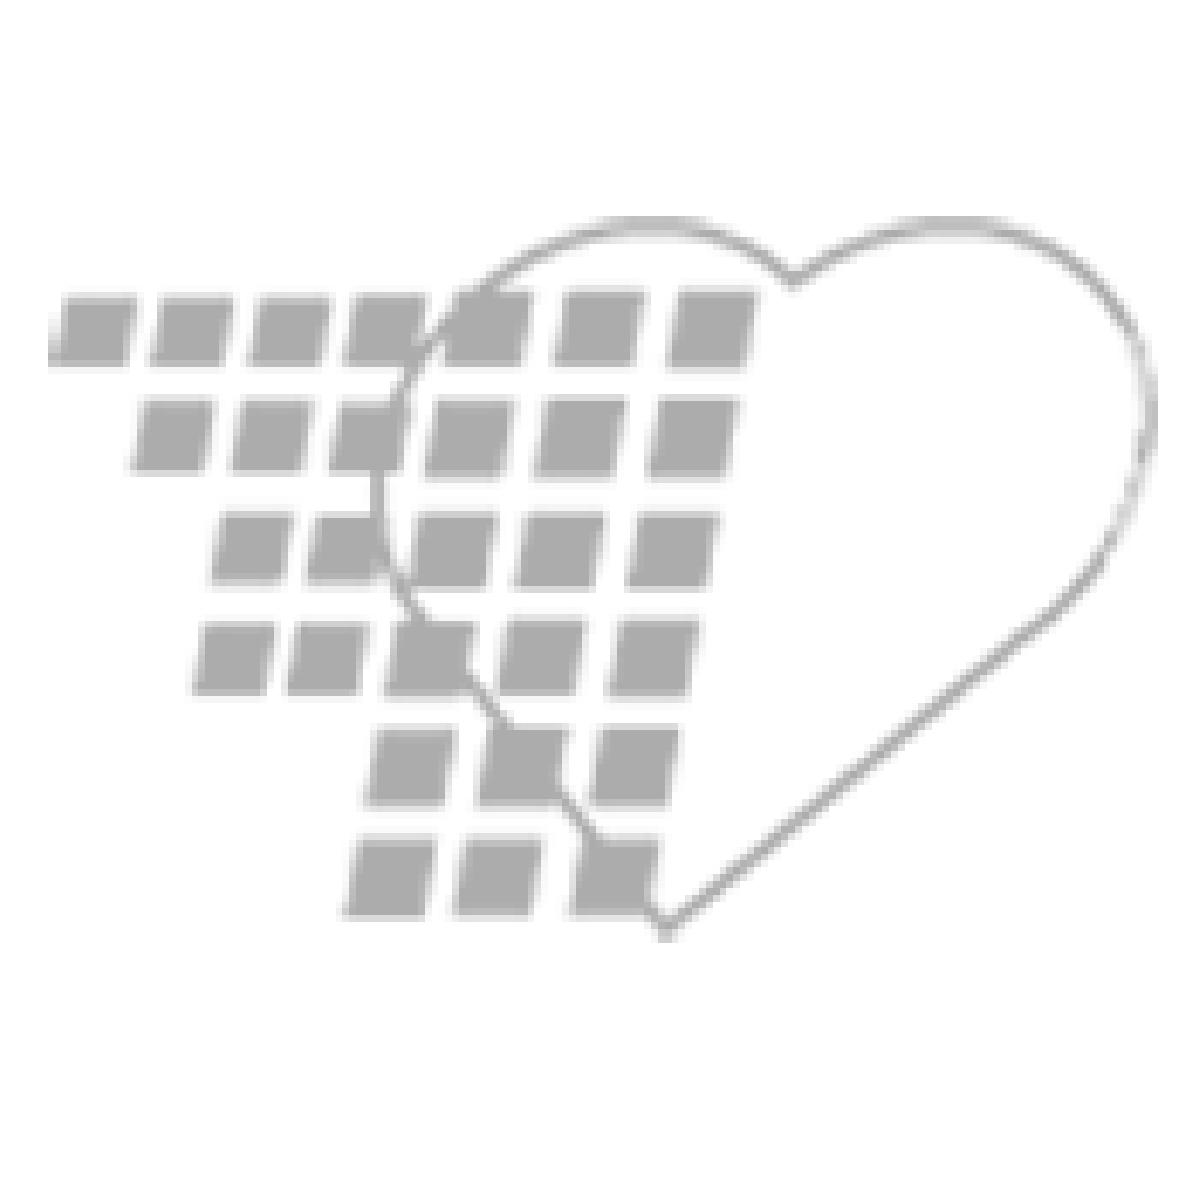 07-71-4020 Argyle™ Thoracic Catheter, Straight